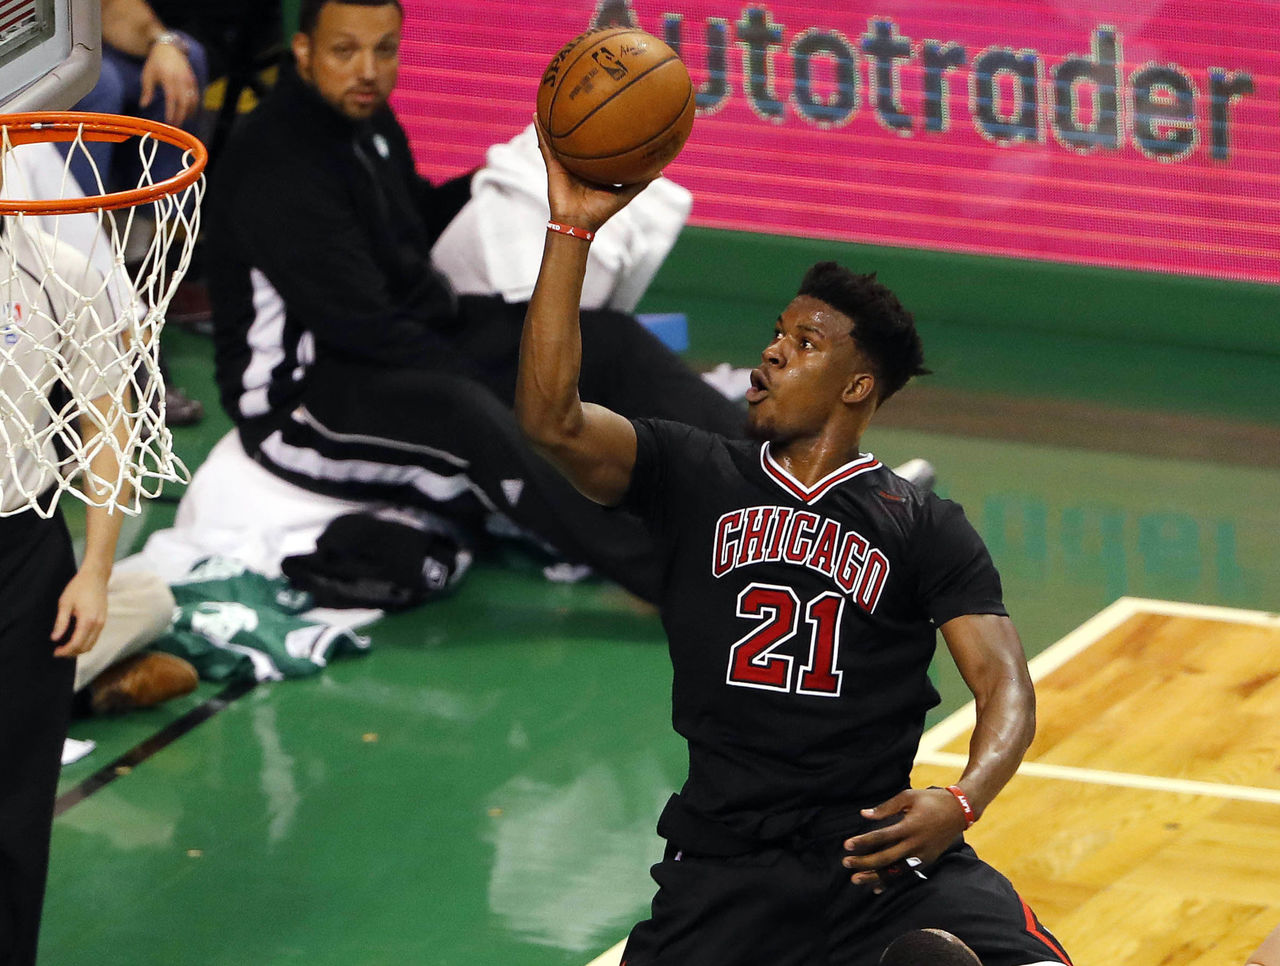 Cropped 2017 04 17t003301z 229206208 nocid rtrmadp 3 nba playoffs chicago bulls at boston celtics